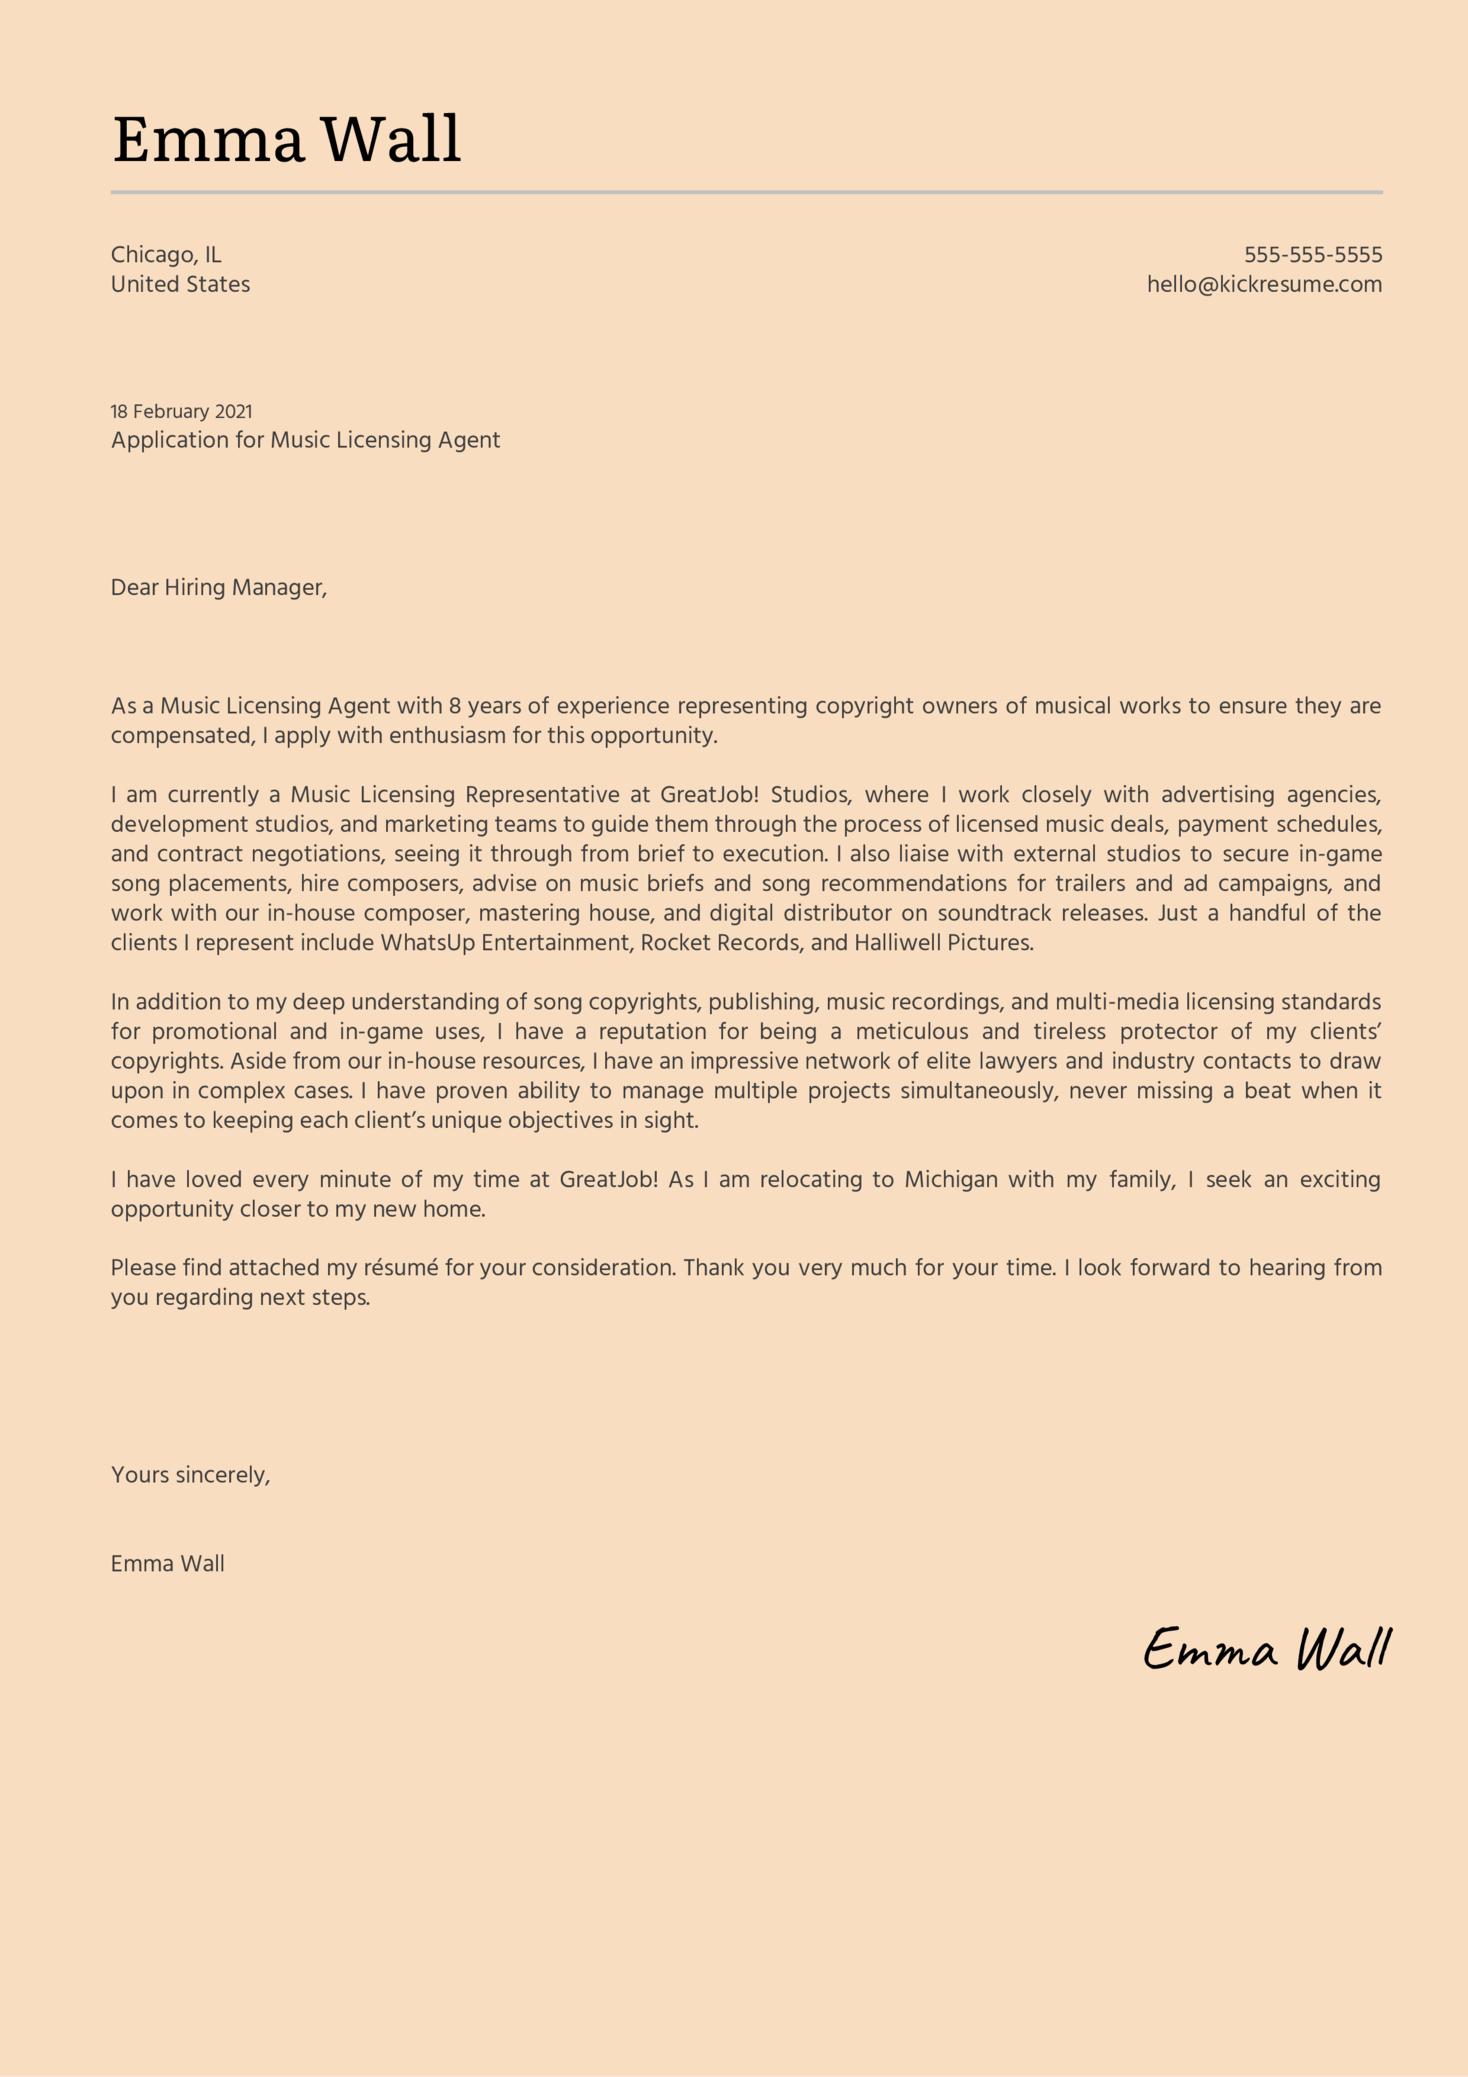 Music Licensing Agent Cover Letter Sample